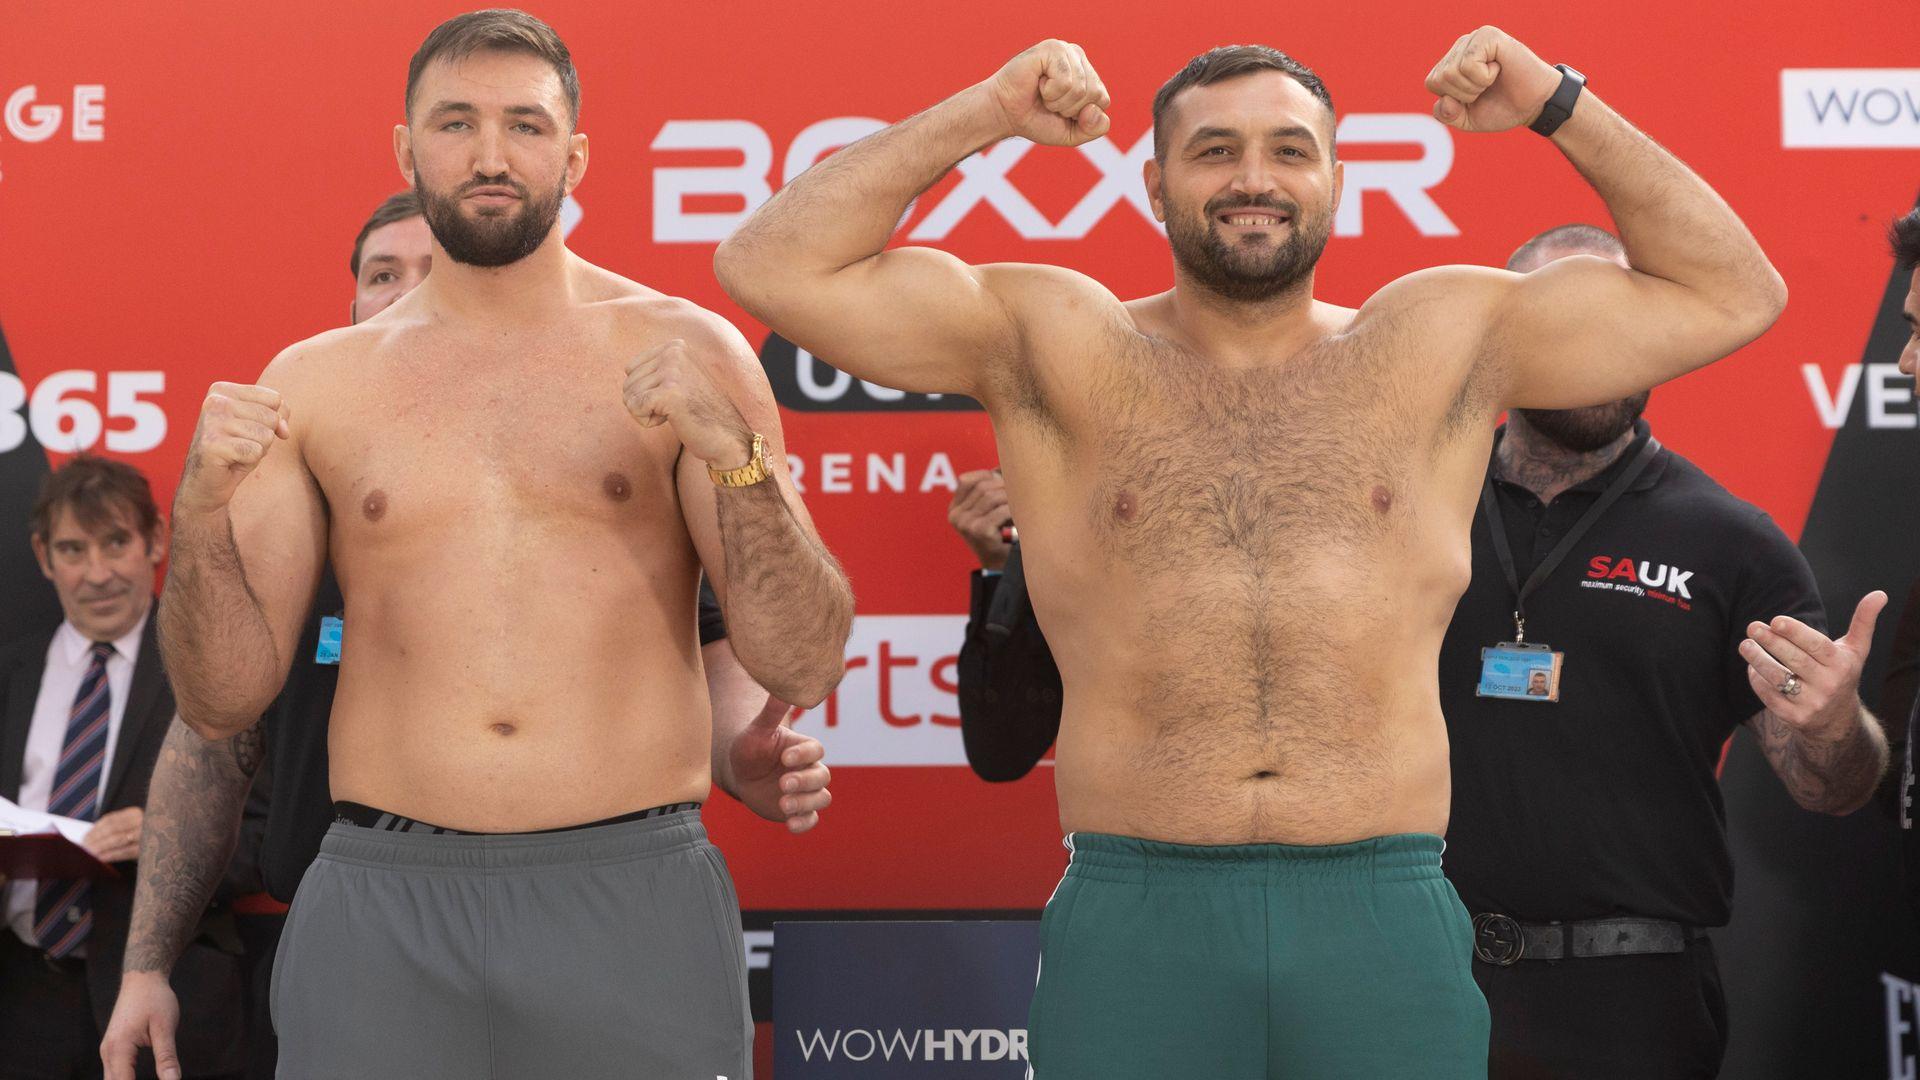 LIVE STREAM: Hughie Fury's heavyweight fight